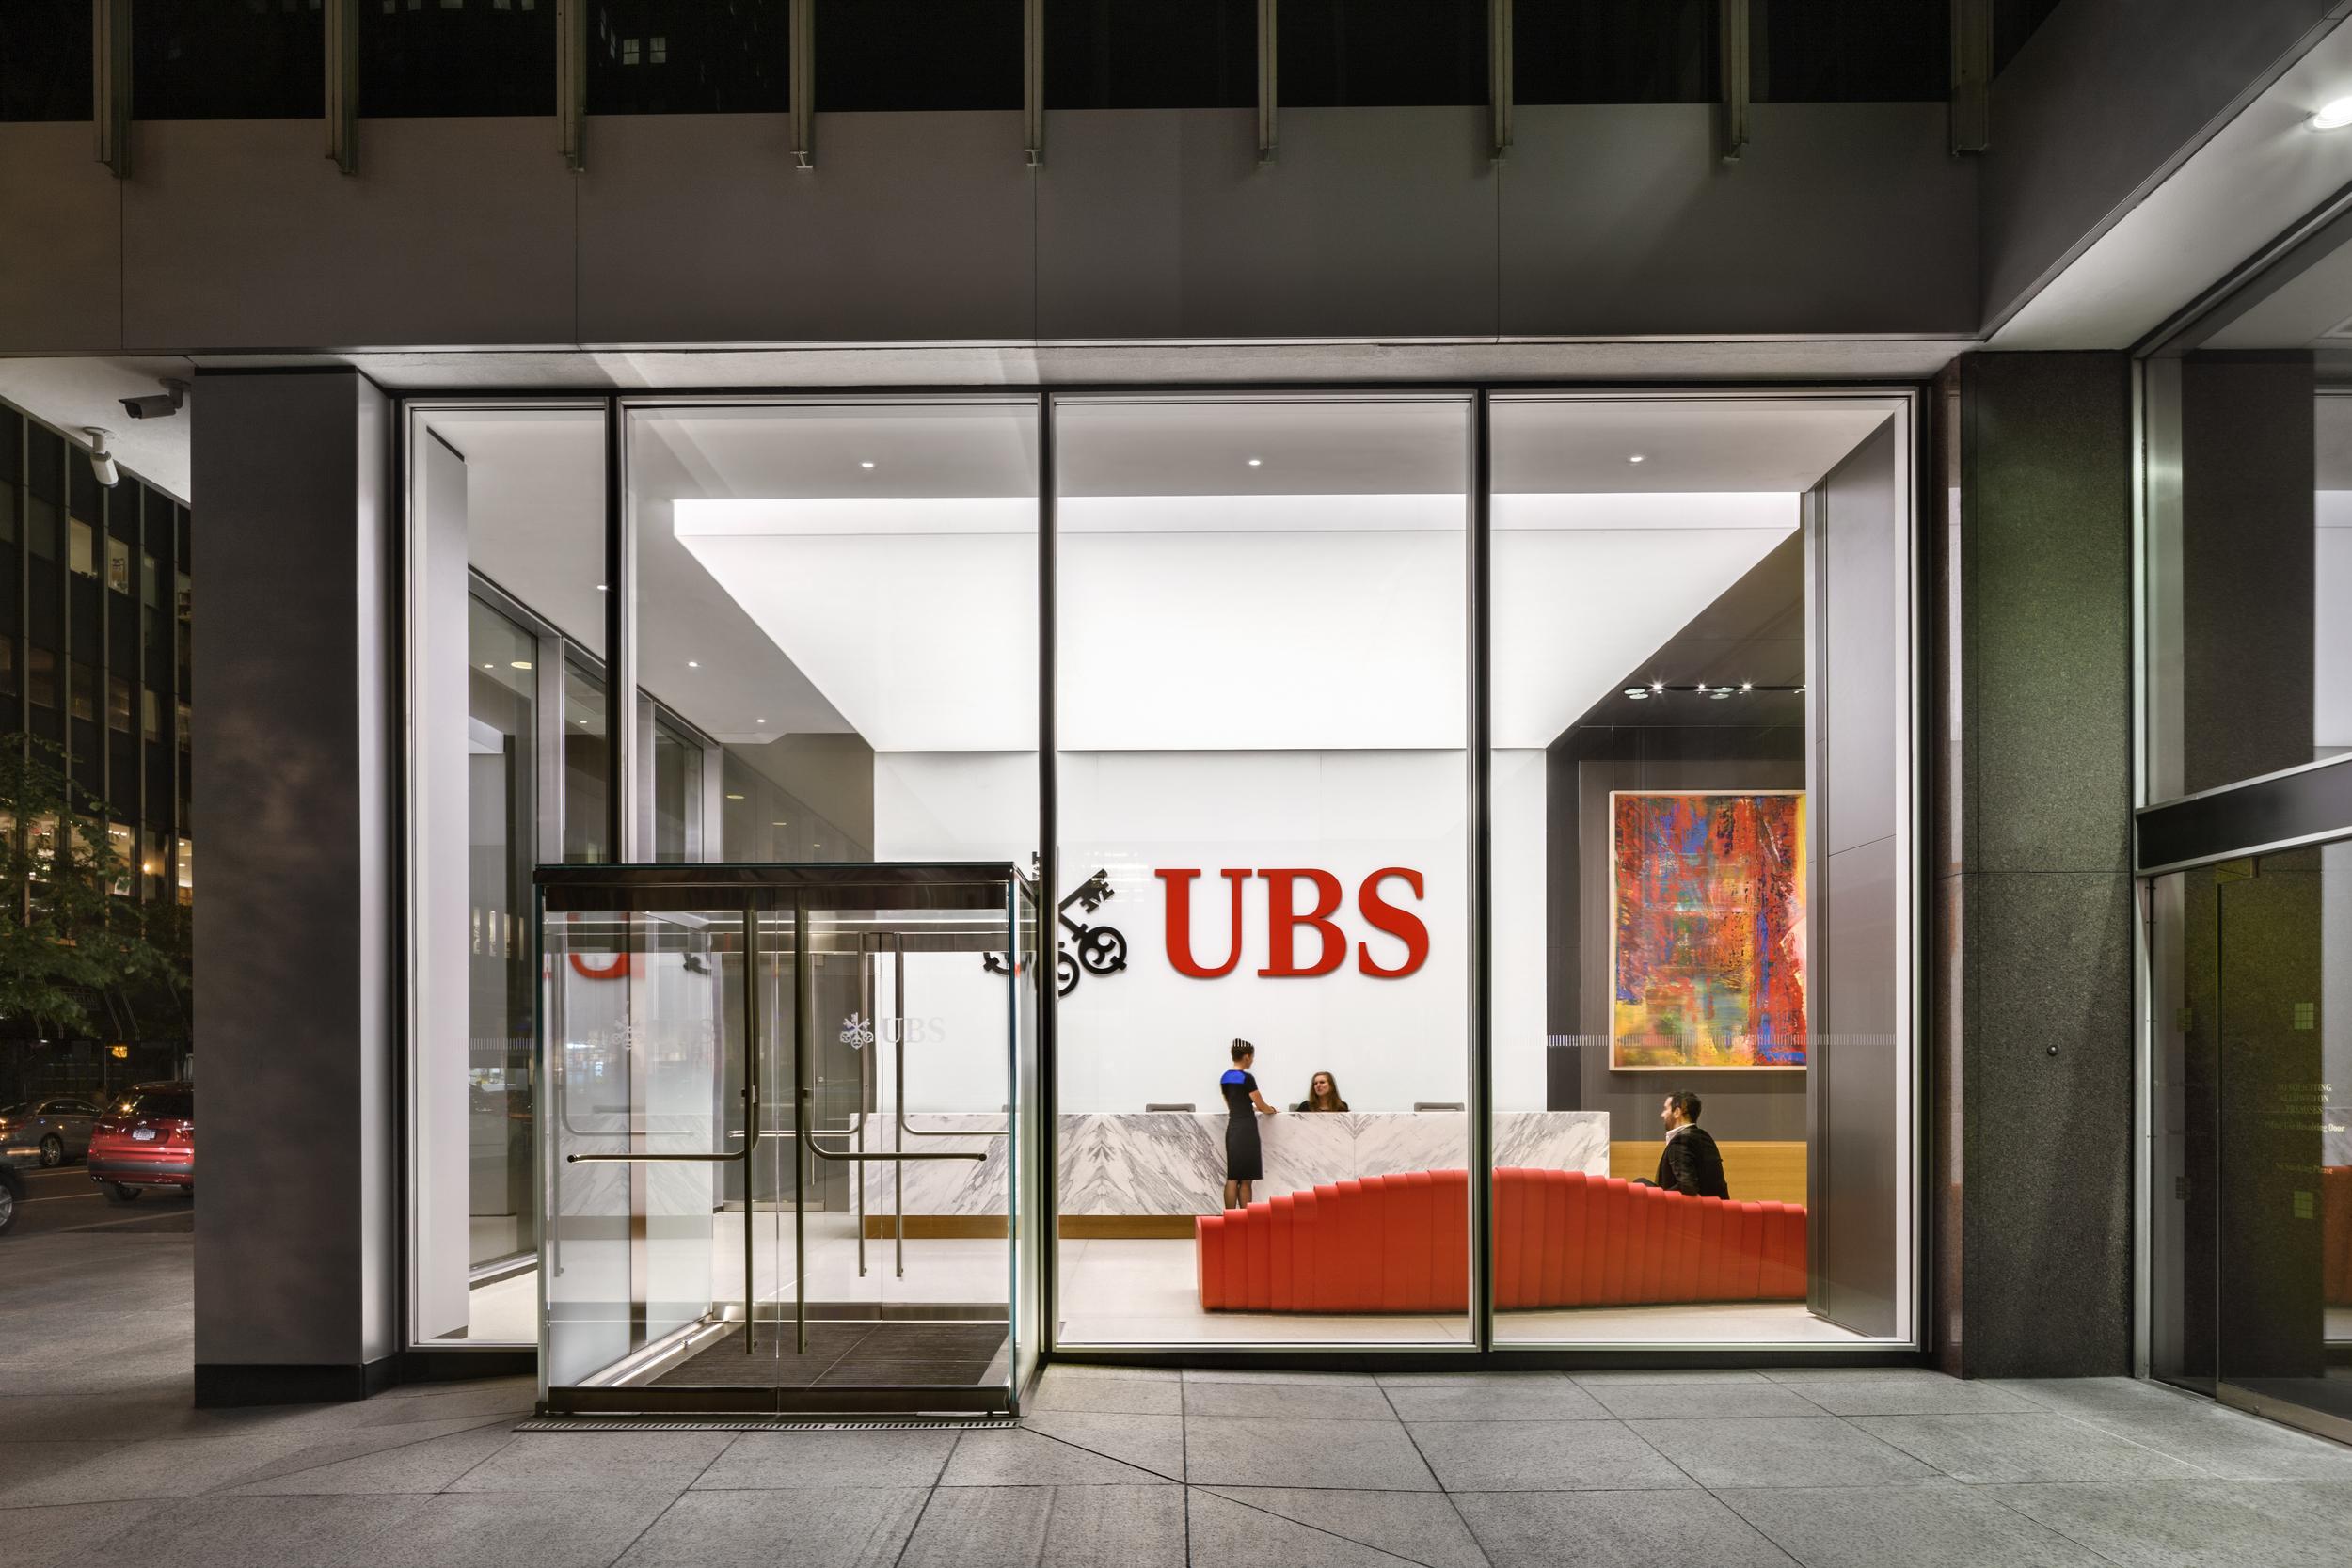 HIPNY_UBS Welcome Center_20140919_03.jpg